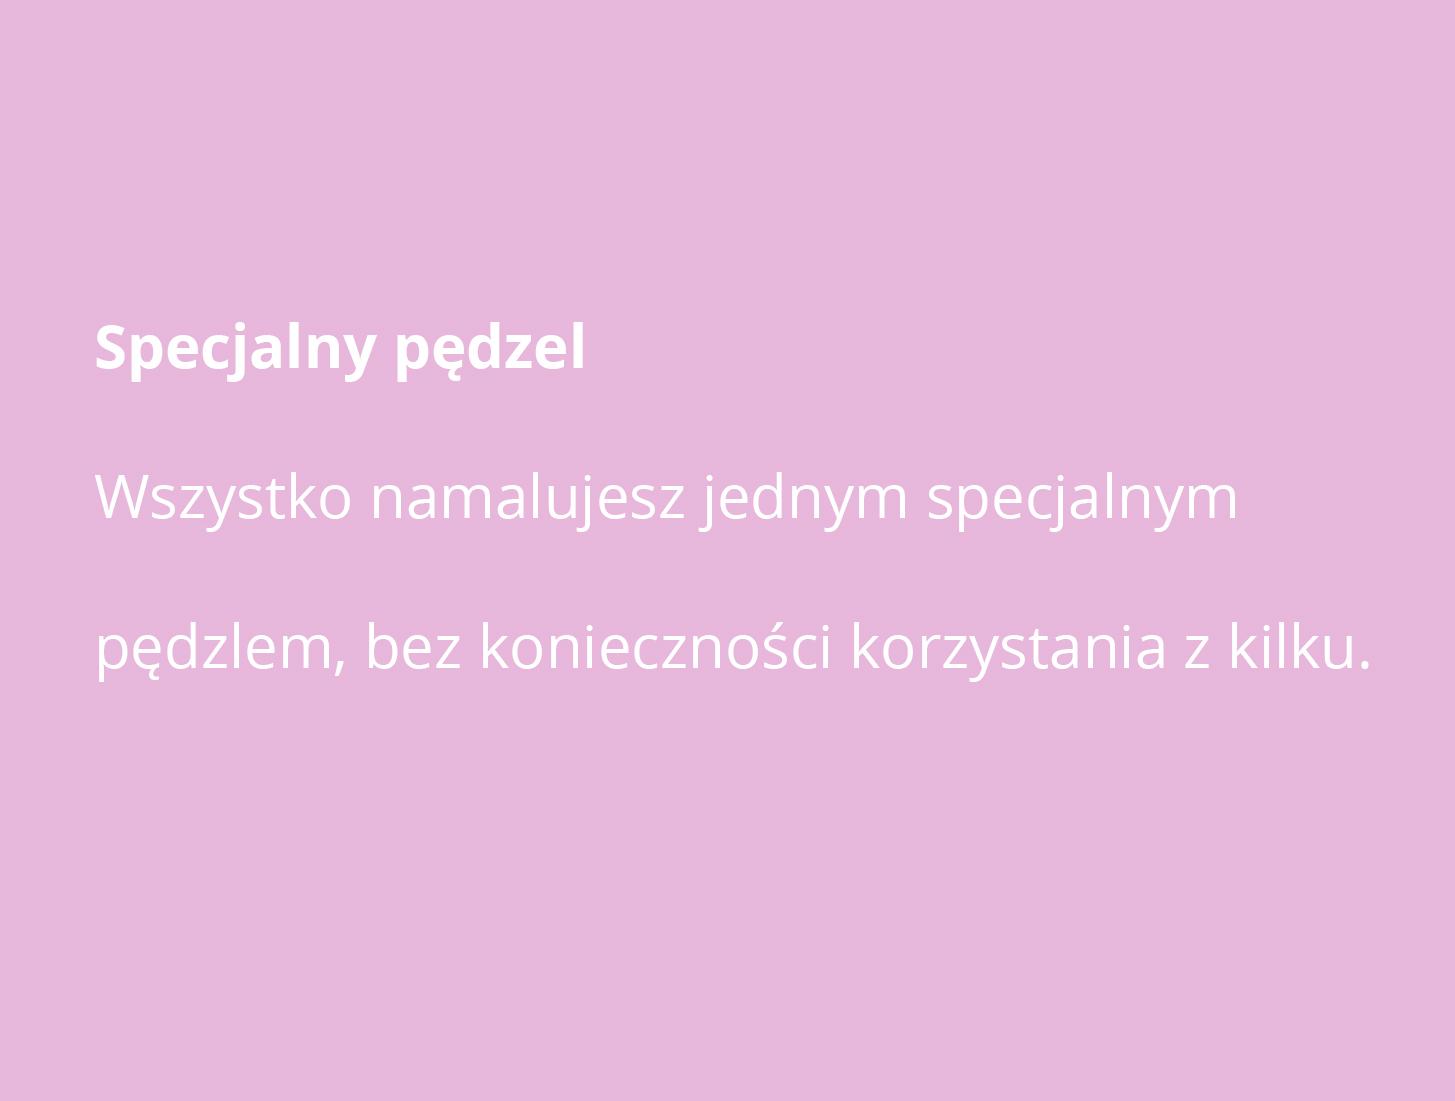 specjalny-pedzel